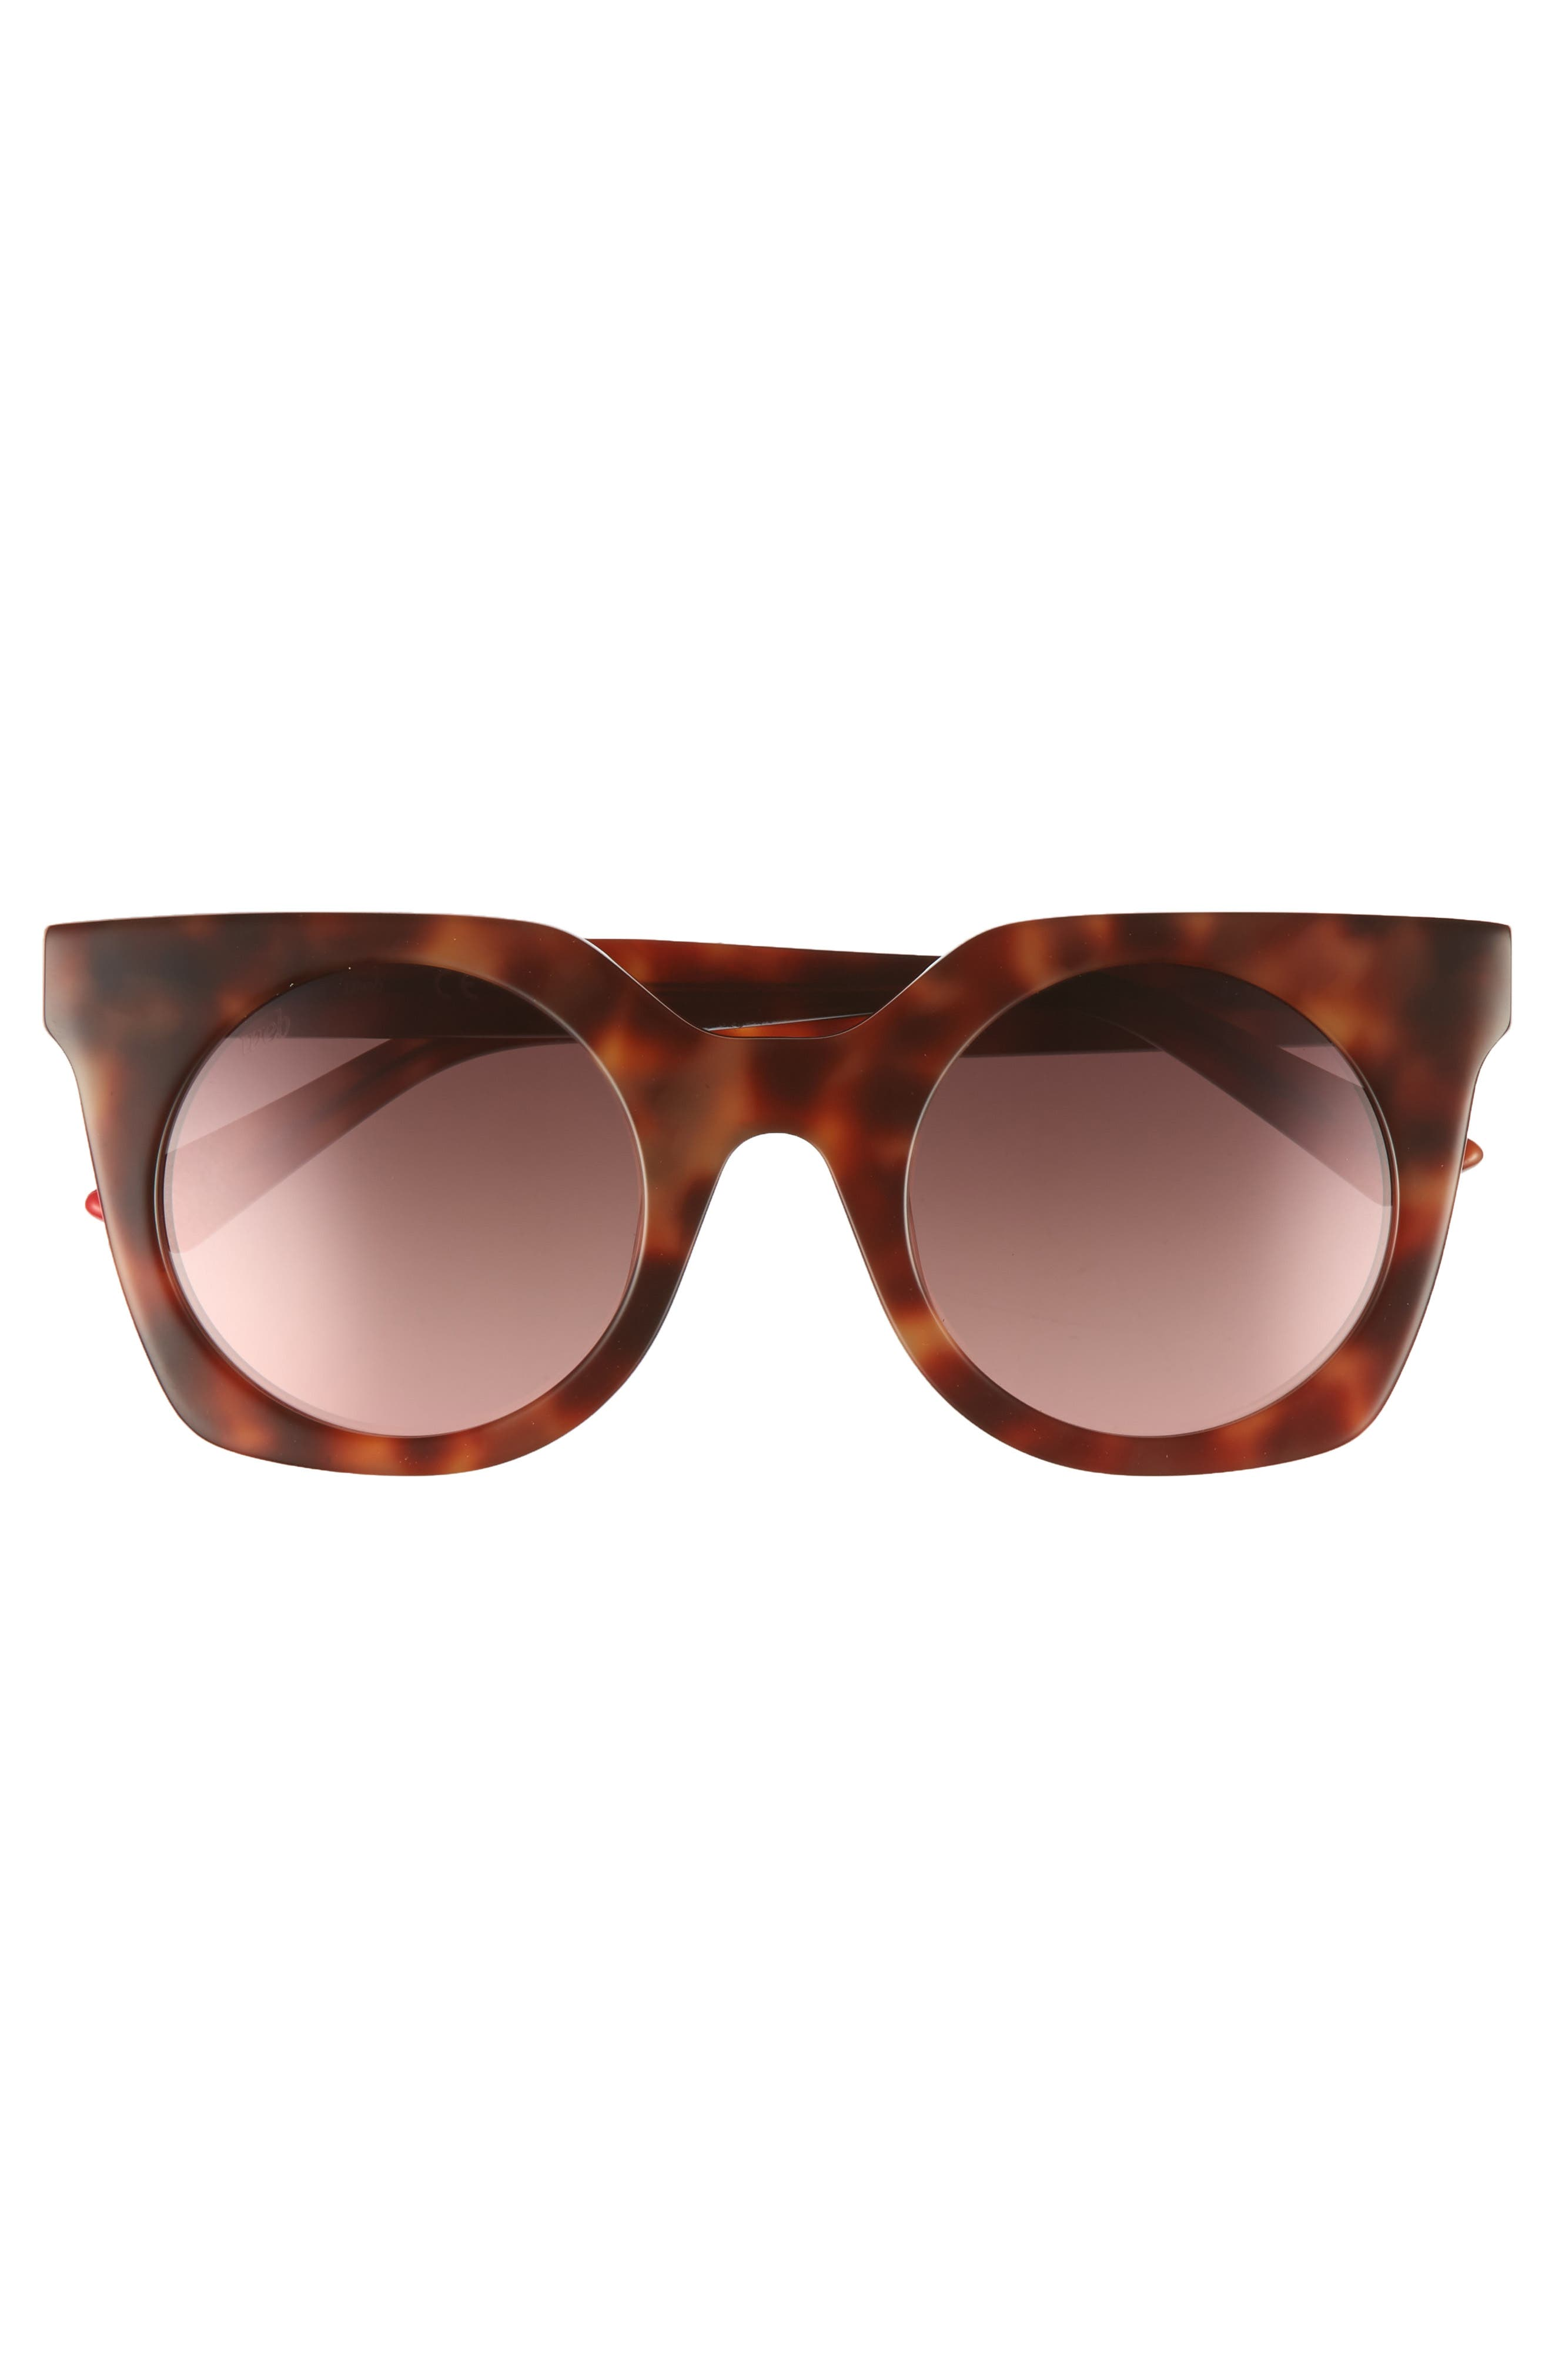 48mm Sunglasses,                             Alternate thumbnail 3, color,                             BLONDE HAVANA/ GRADIENT